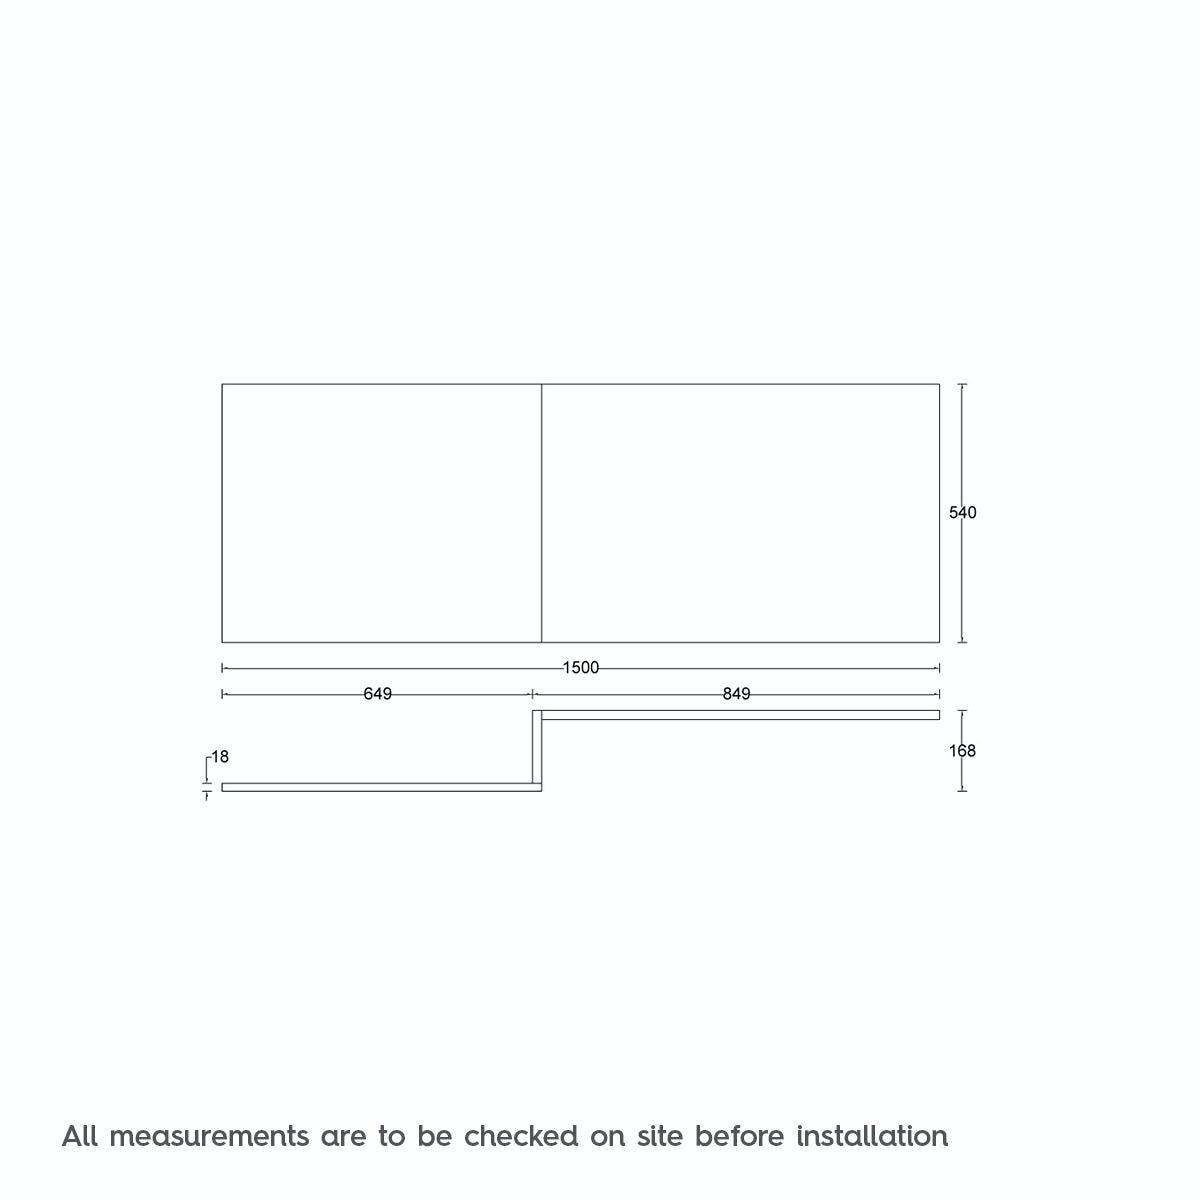 Dimensions for L shaped shower bath wooden front panel Drift oak 1500mm